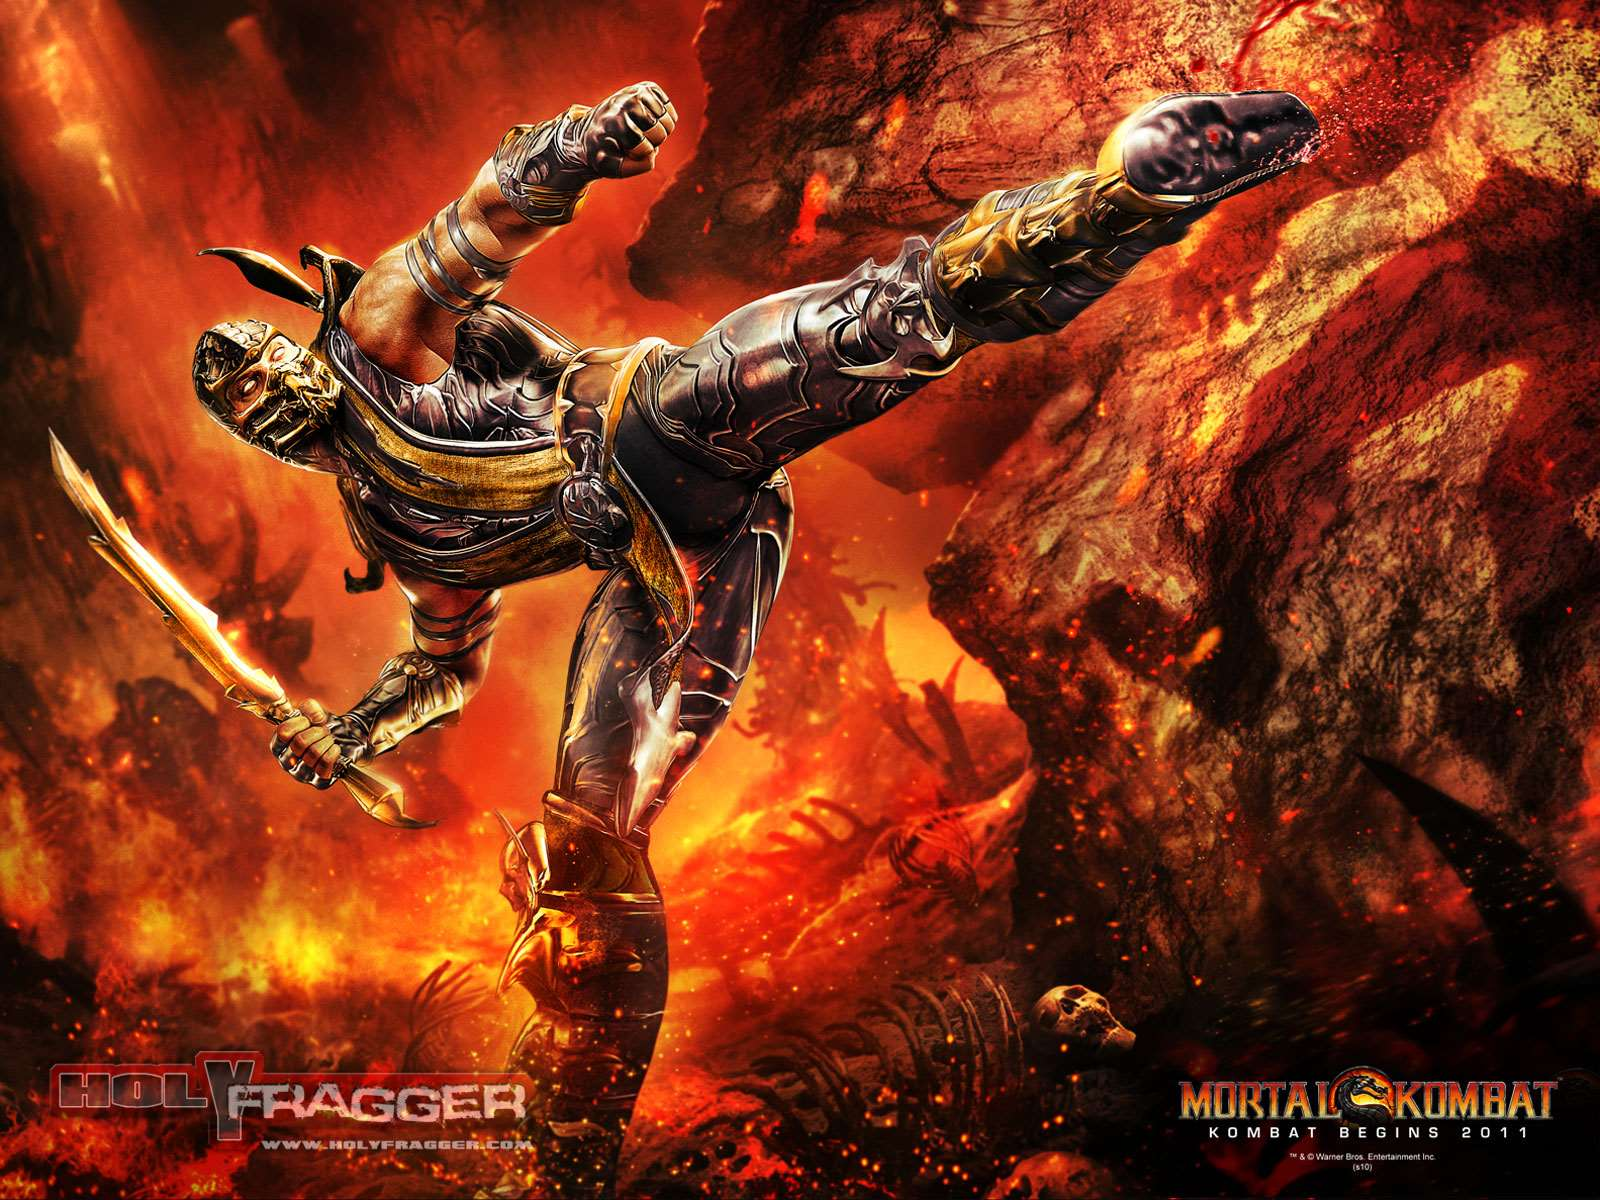 mortal kombat mortal kombat wallpaper - scorpion wallpaper - mortal